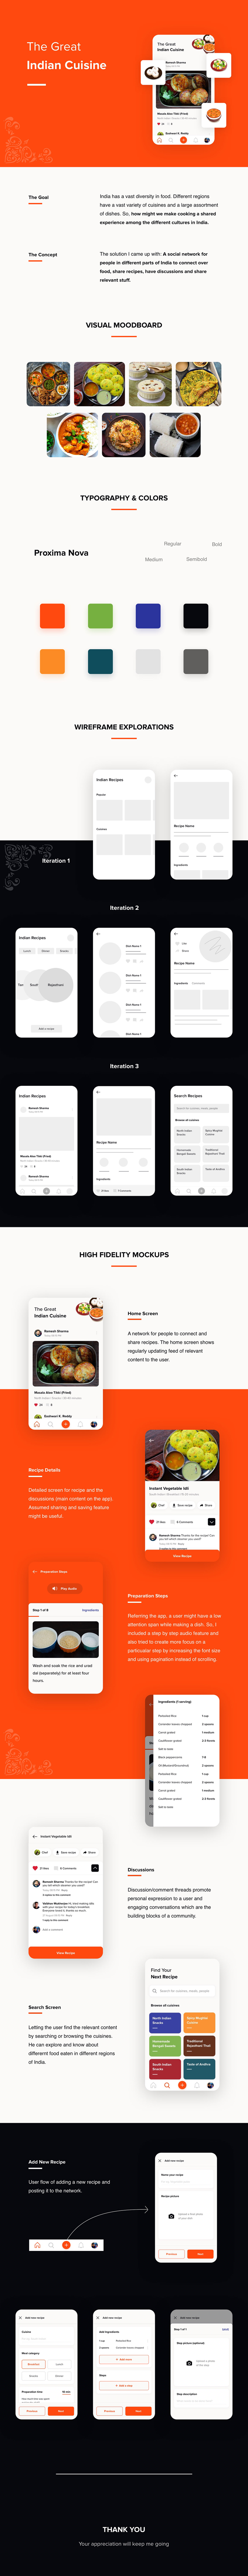 India Indian cuisine Food  recipe mobile app social network UI ux design